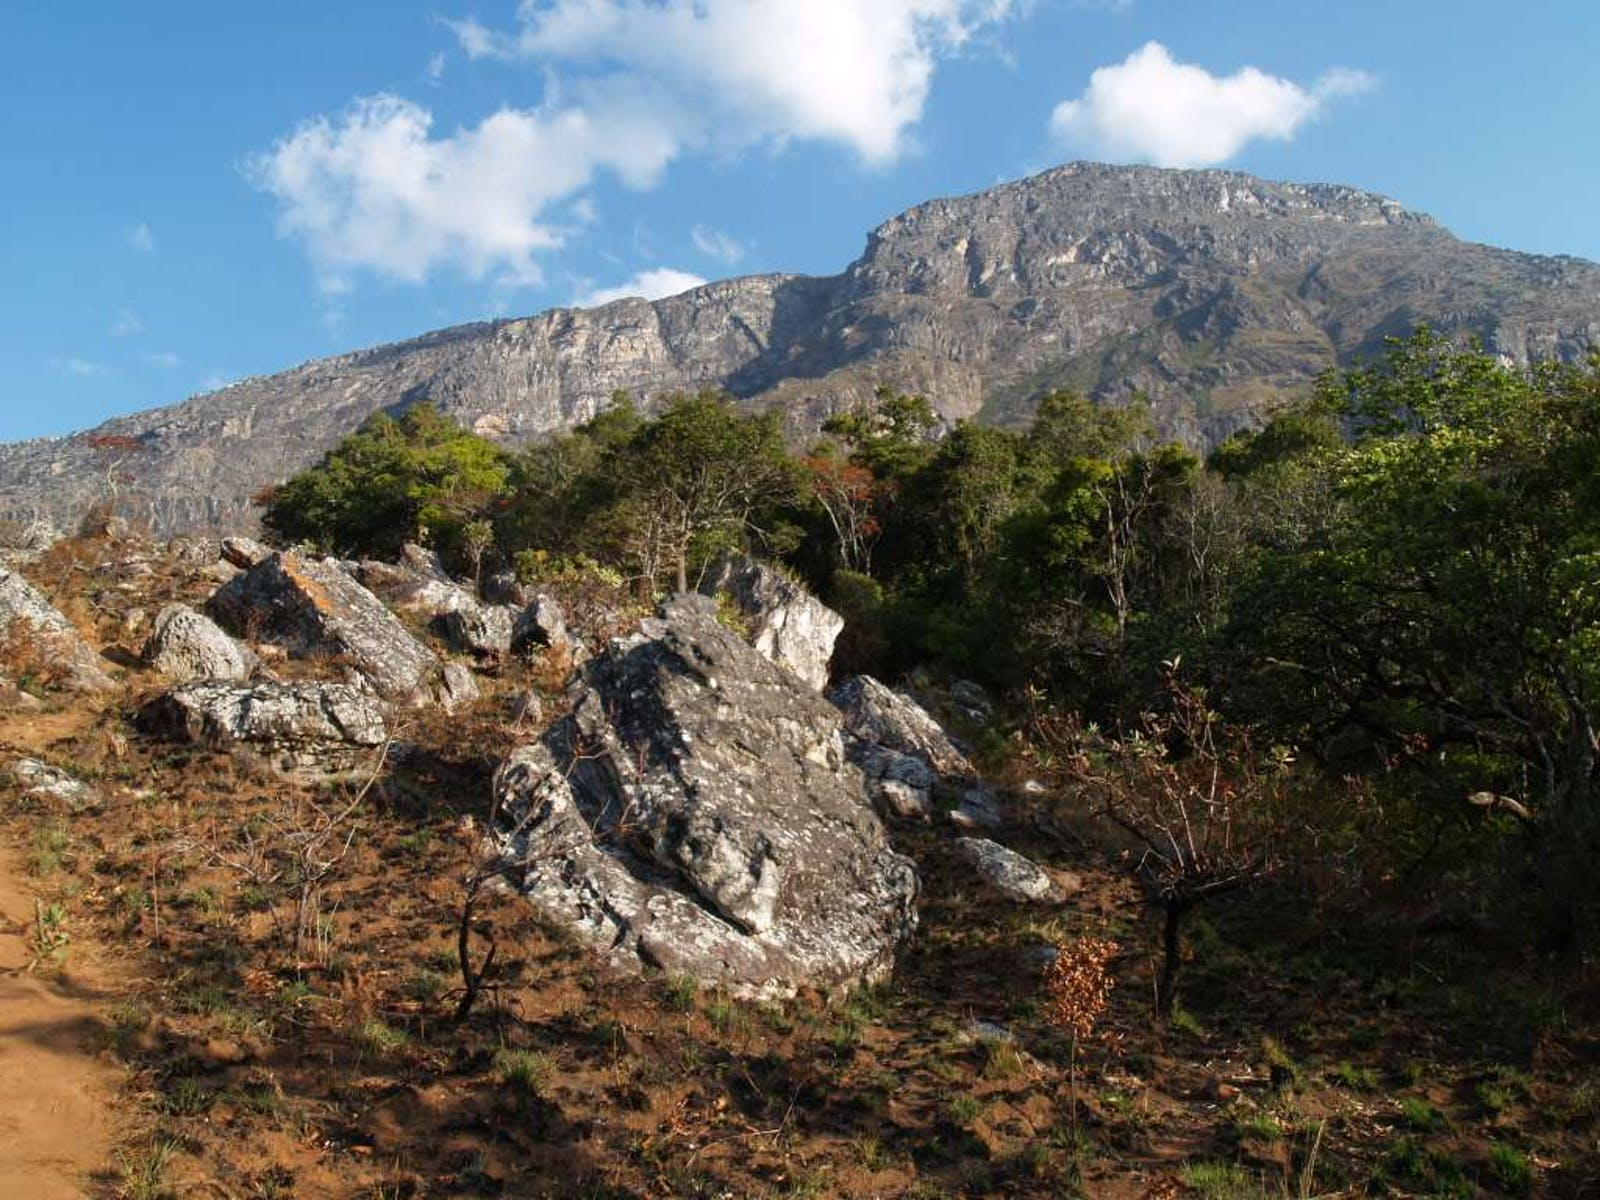 Nyanga-Chimanimani Montane Forest-Grassland